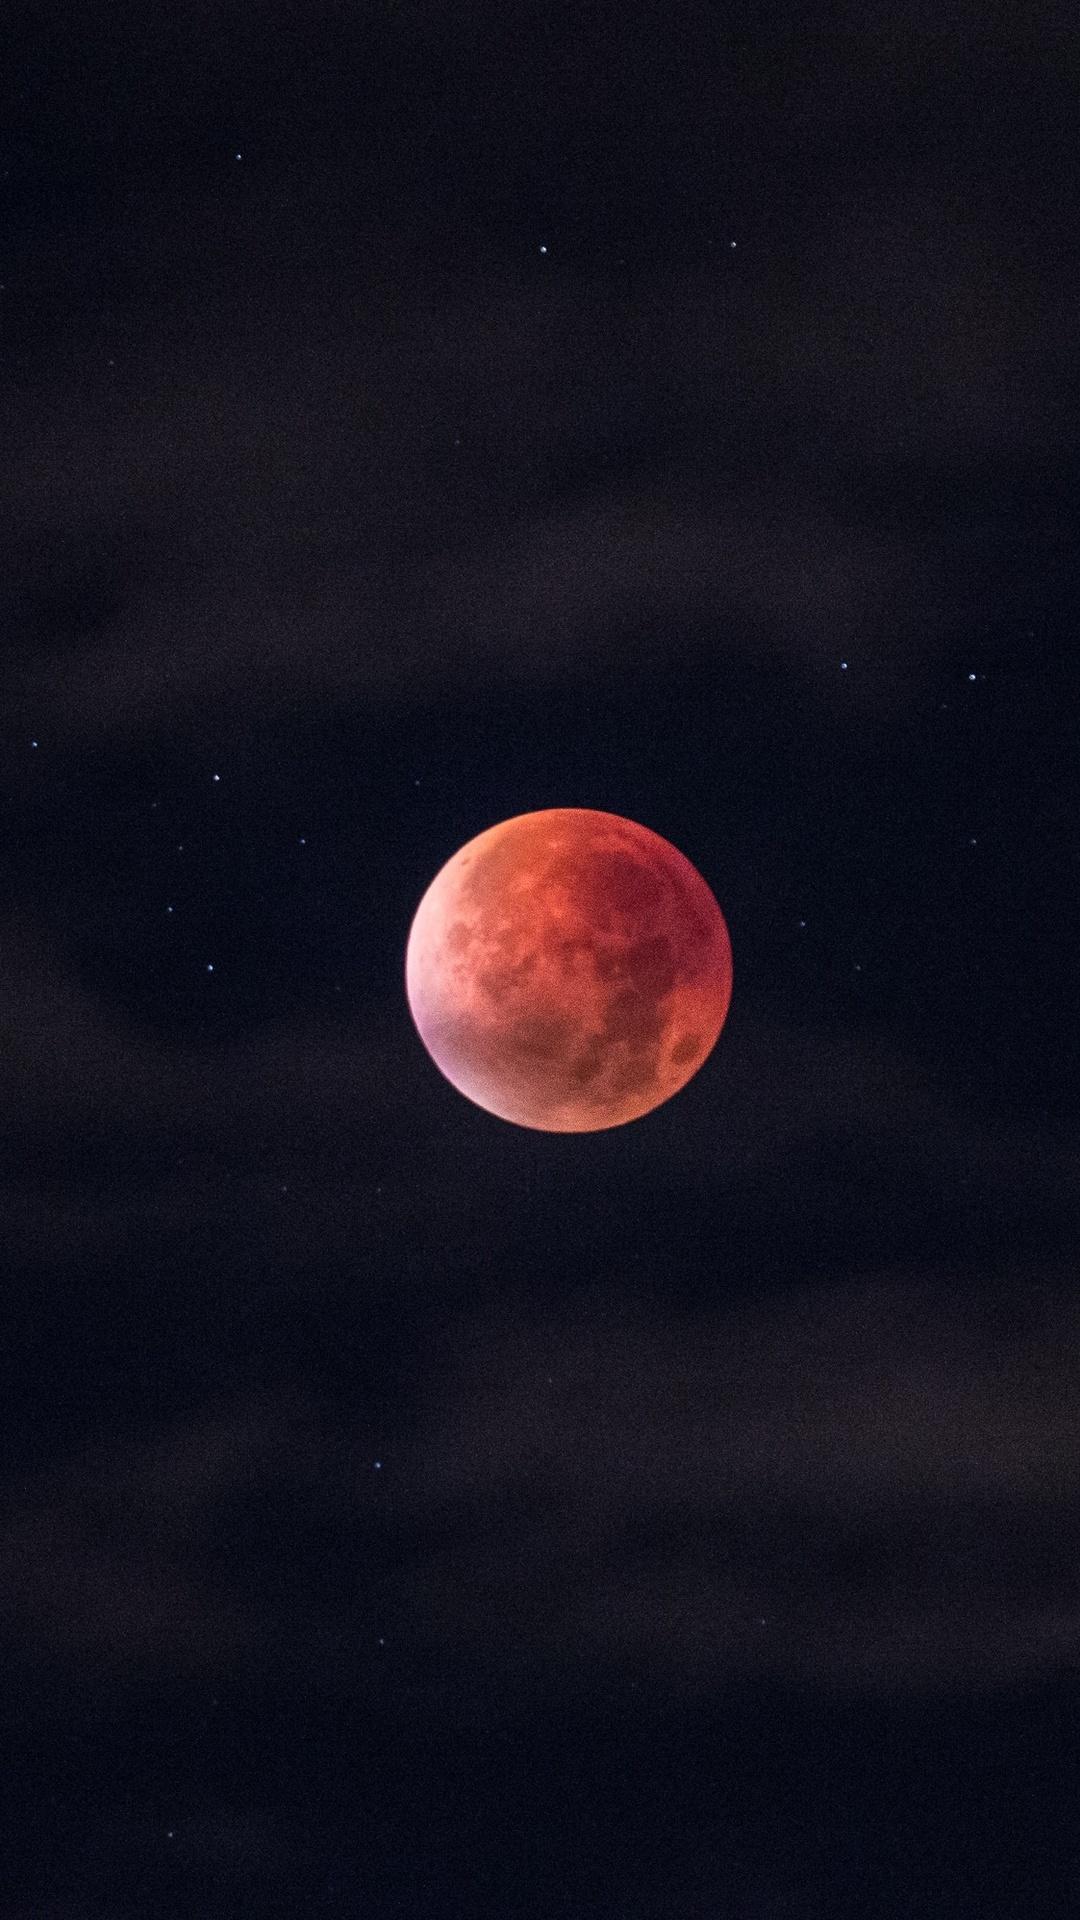 1080x1920 Blood Moon Iphone 7 6s 6 Plus Pixel Xl One Plus